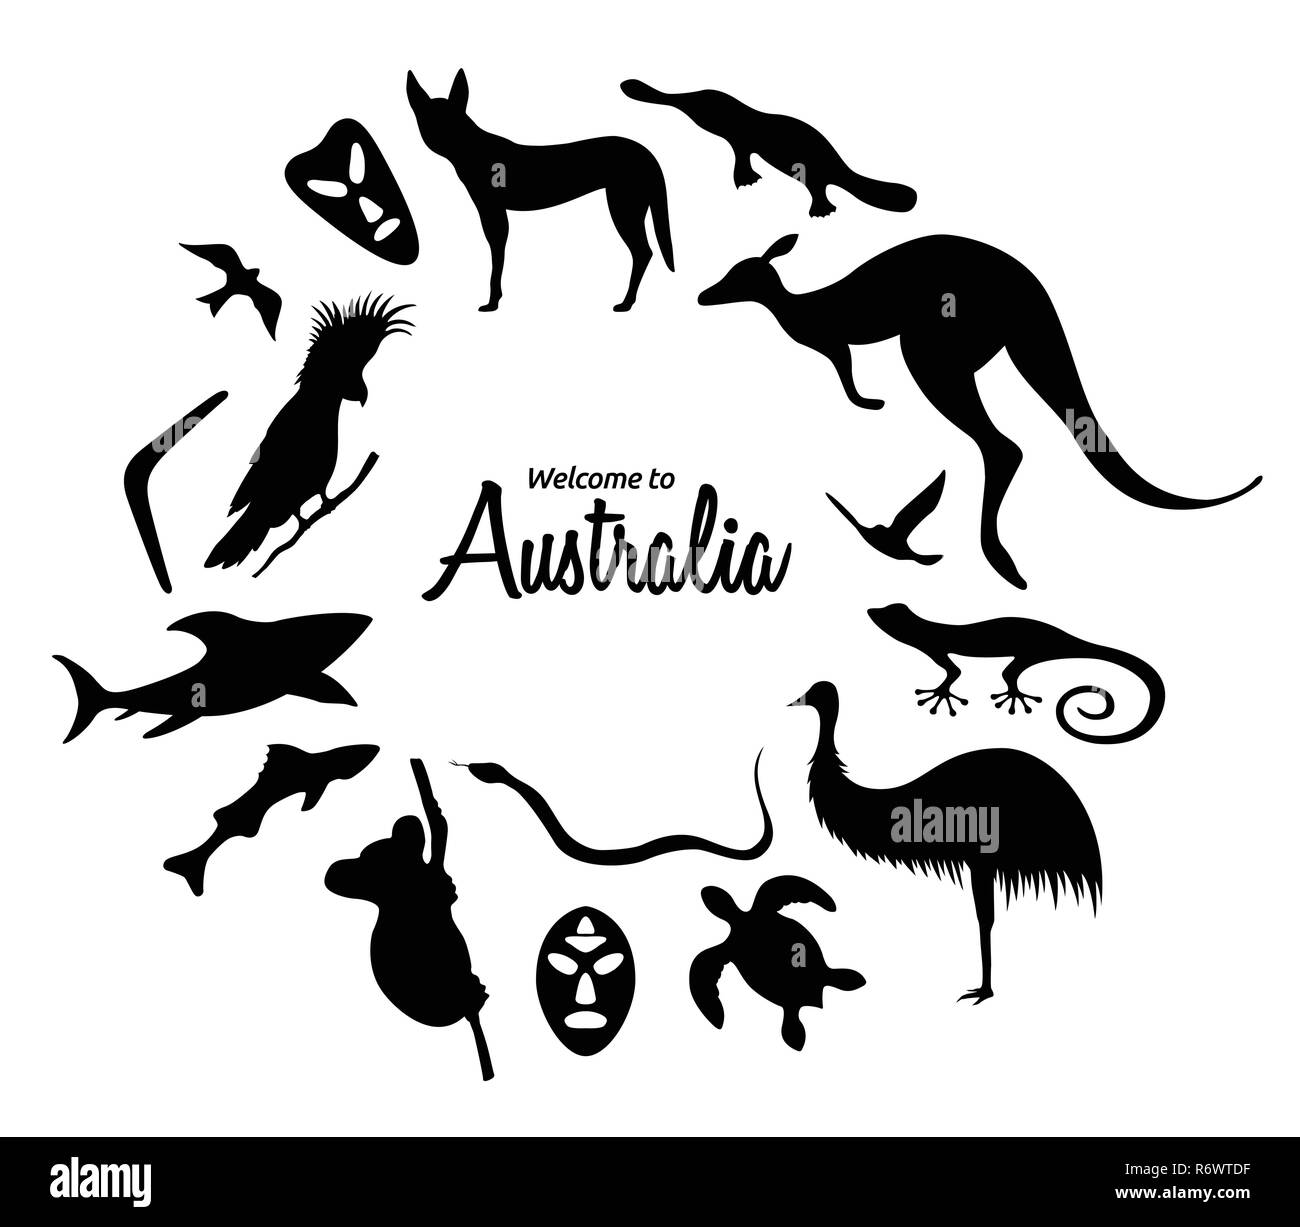 Conjunto de siluetas de animales australianos. La naturaleza de Australia. Aislado sobre fondo blanco. Silueta negra de Kangaroo, máscaras, tiburón, boomerang, Imagen De Stock